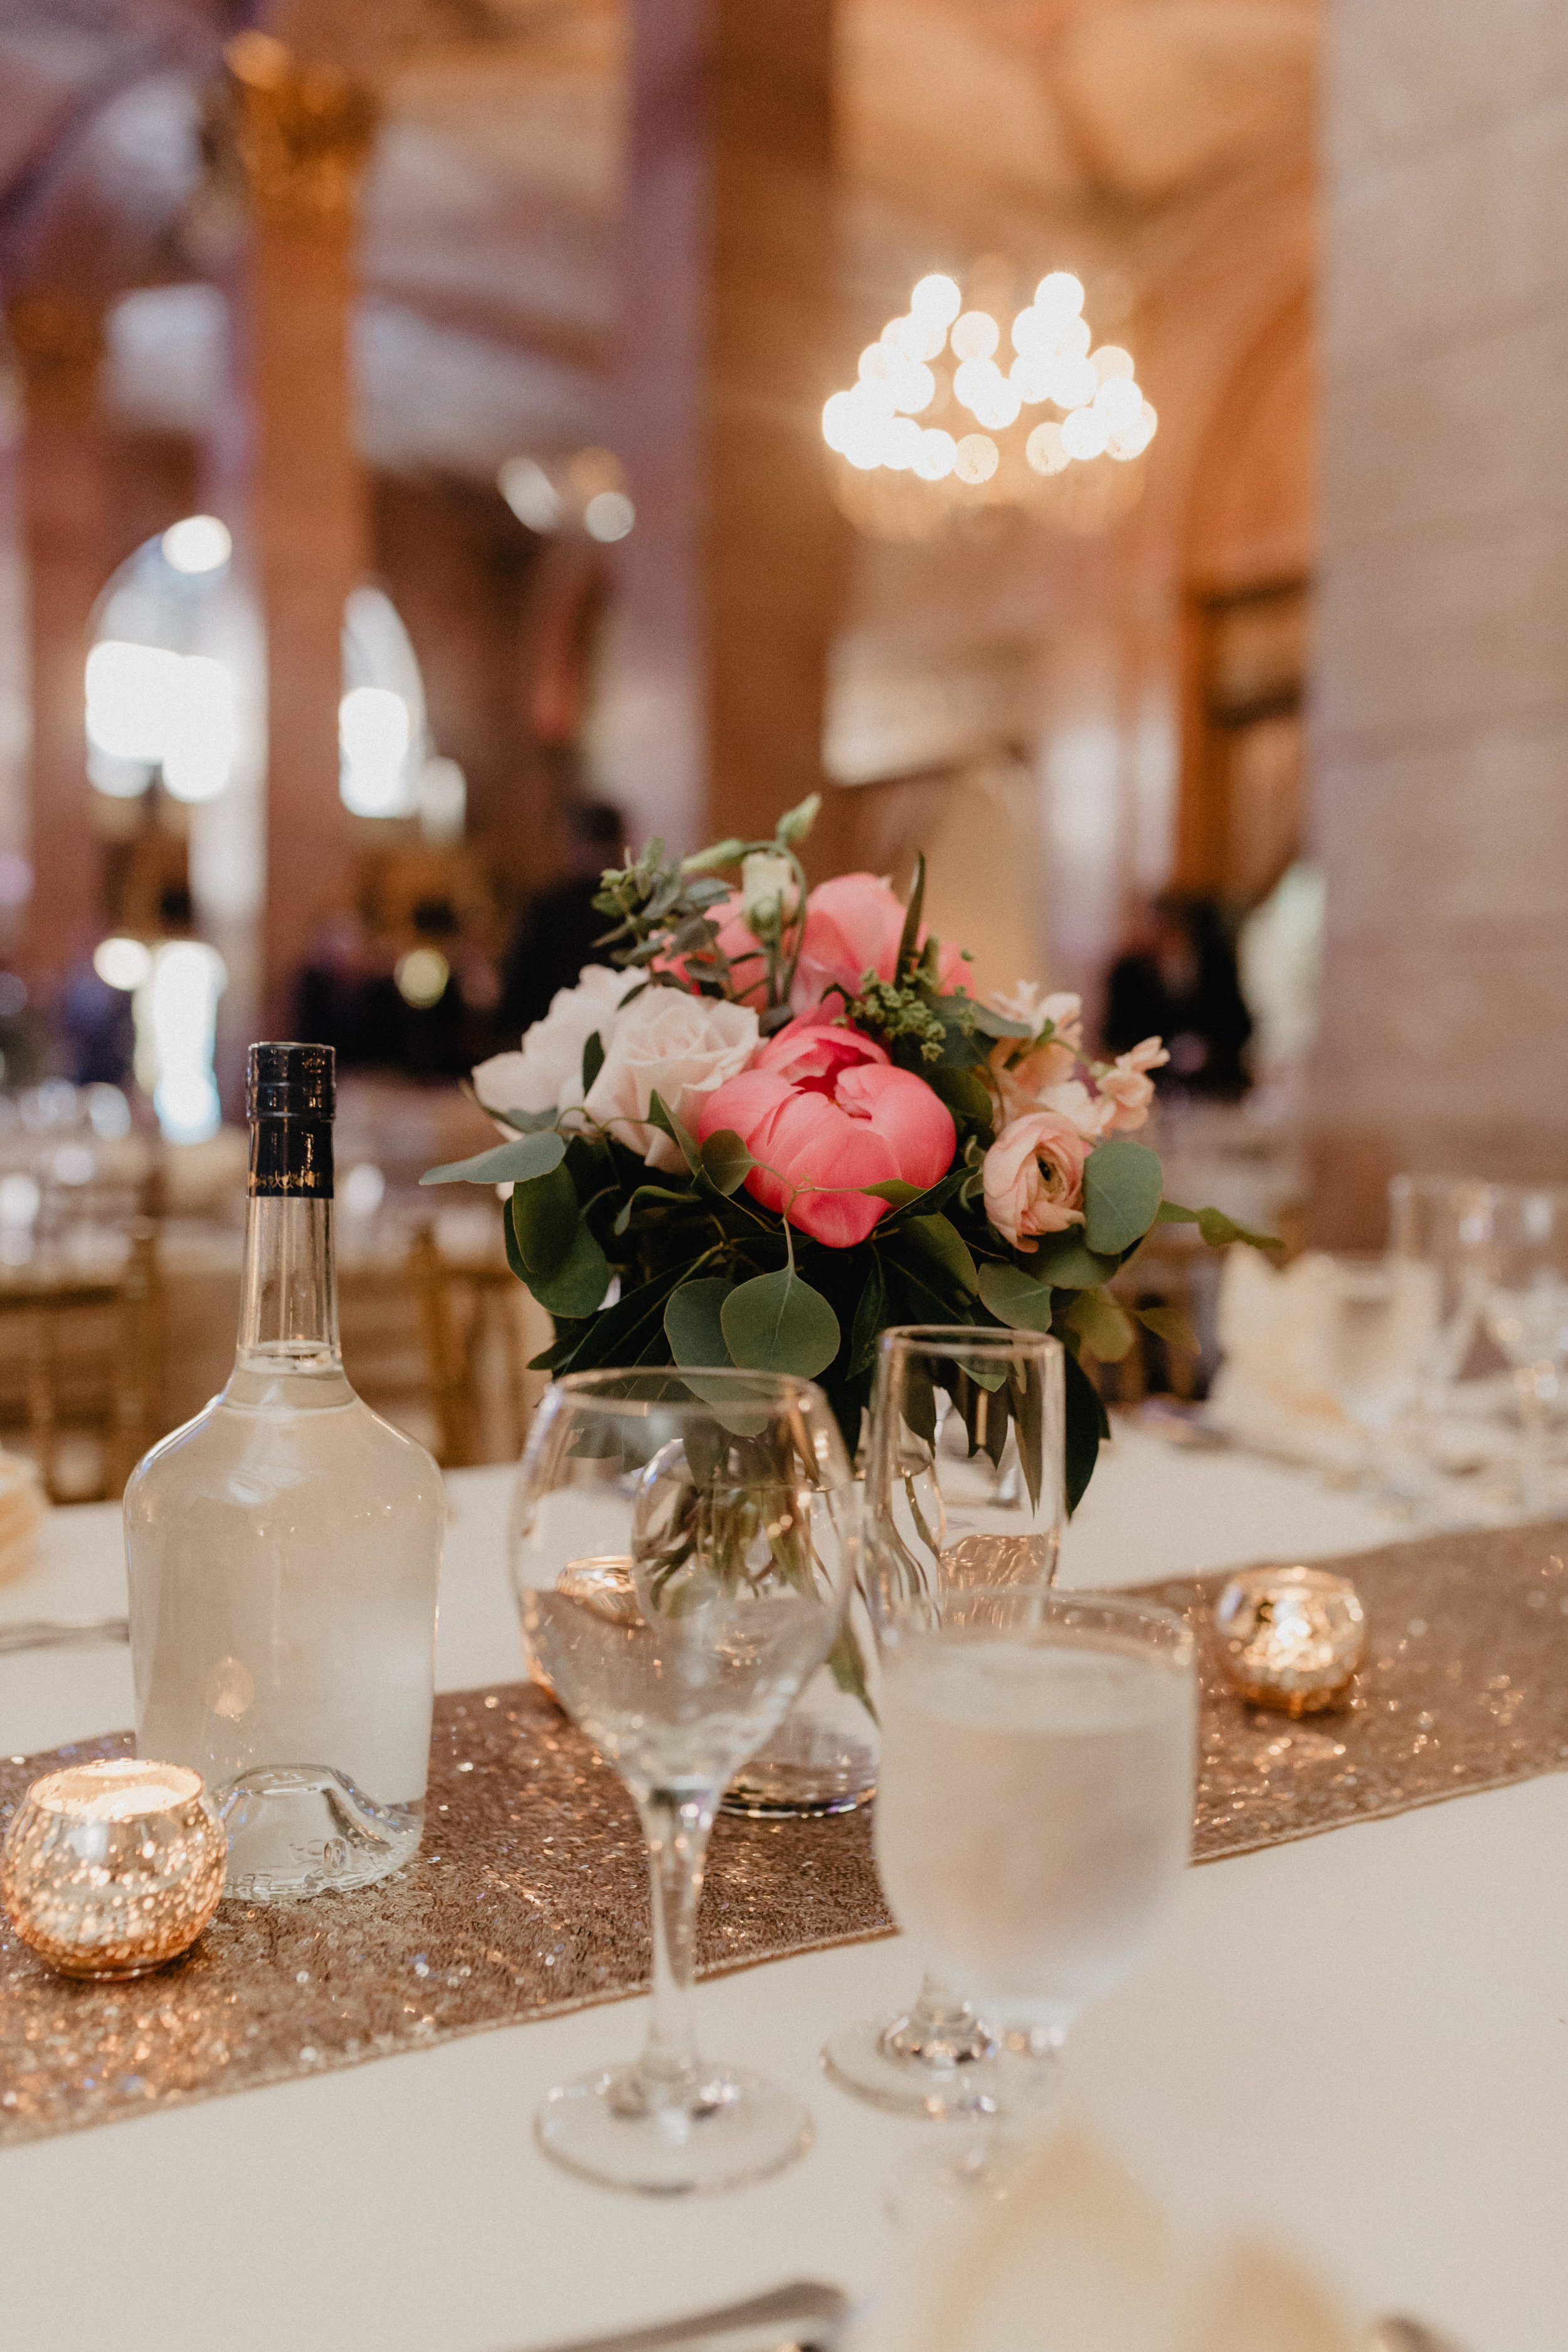 albany-new-york-wedding-46.jpg